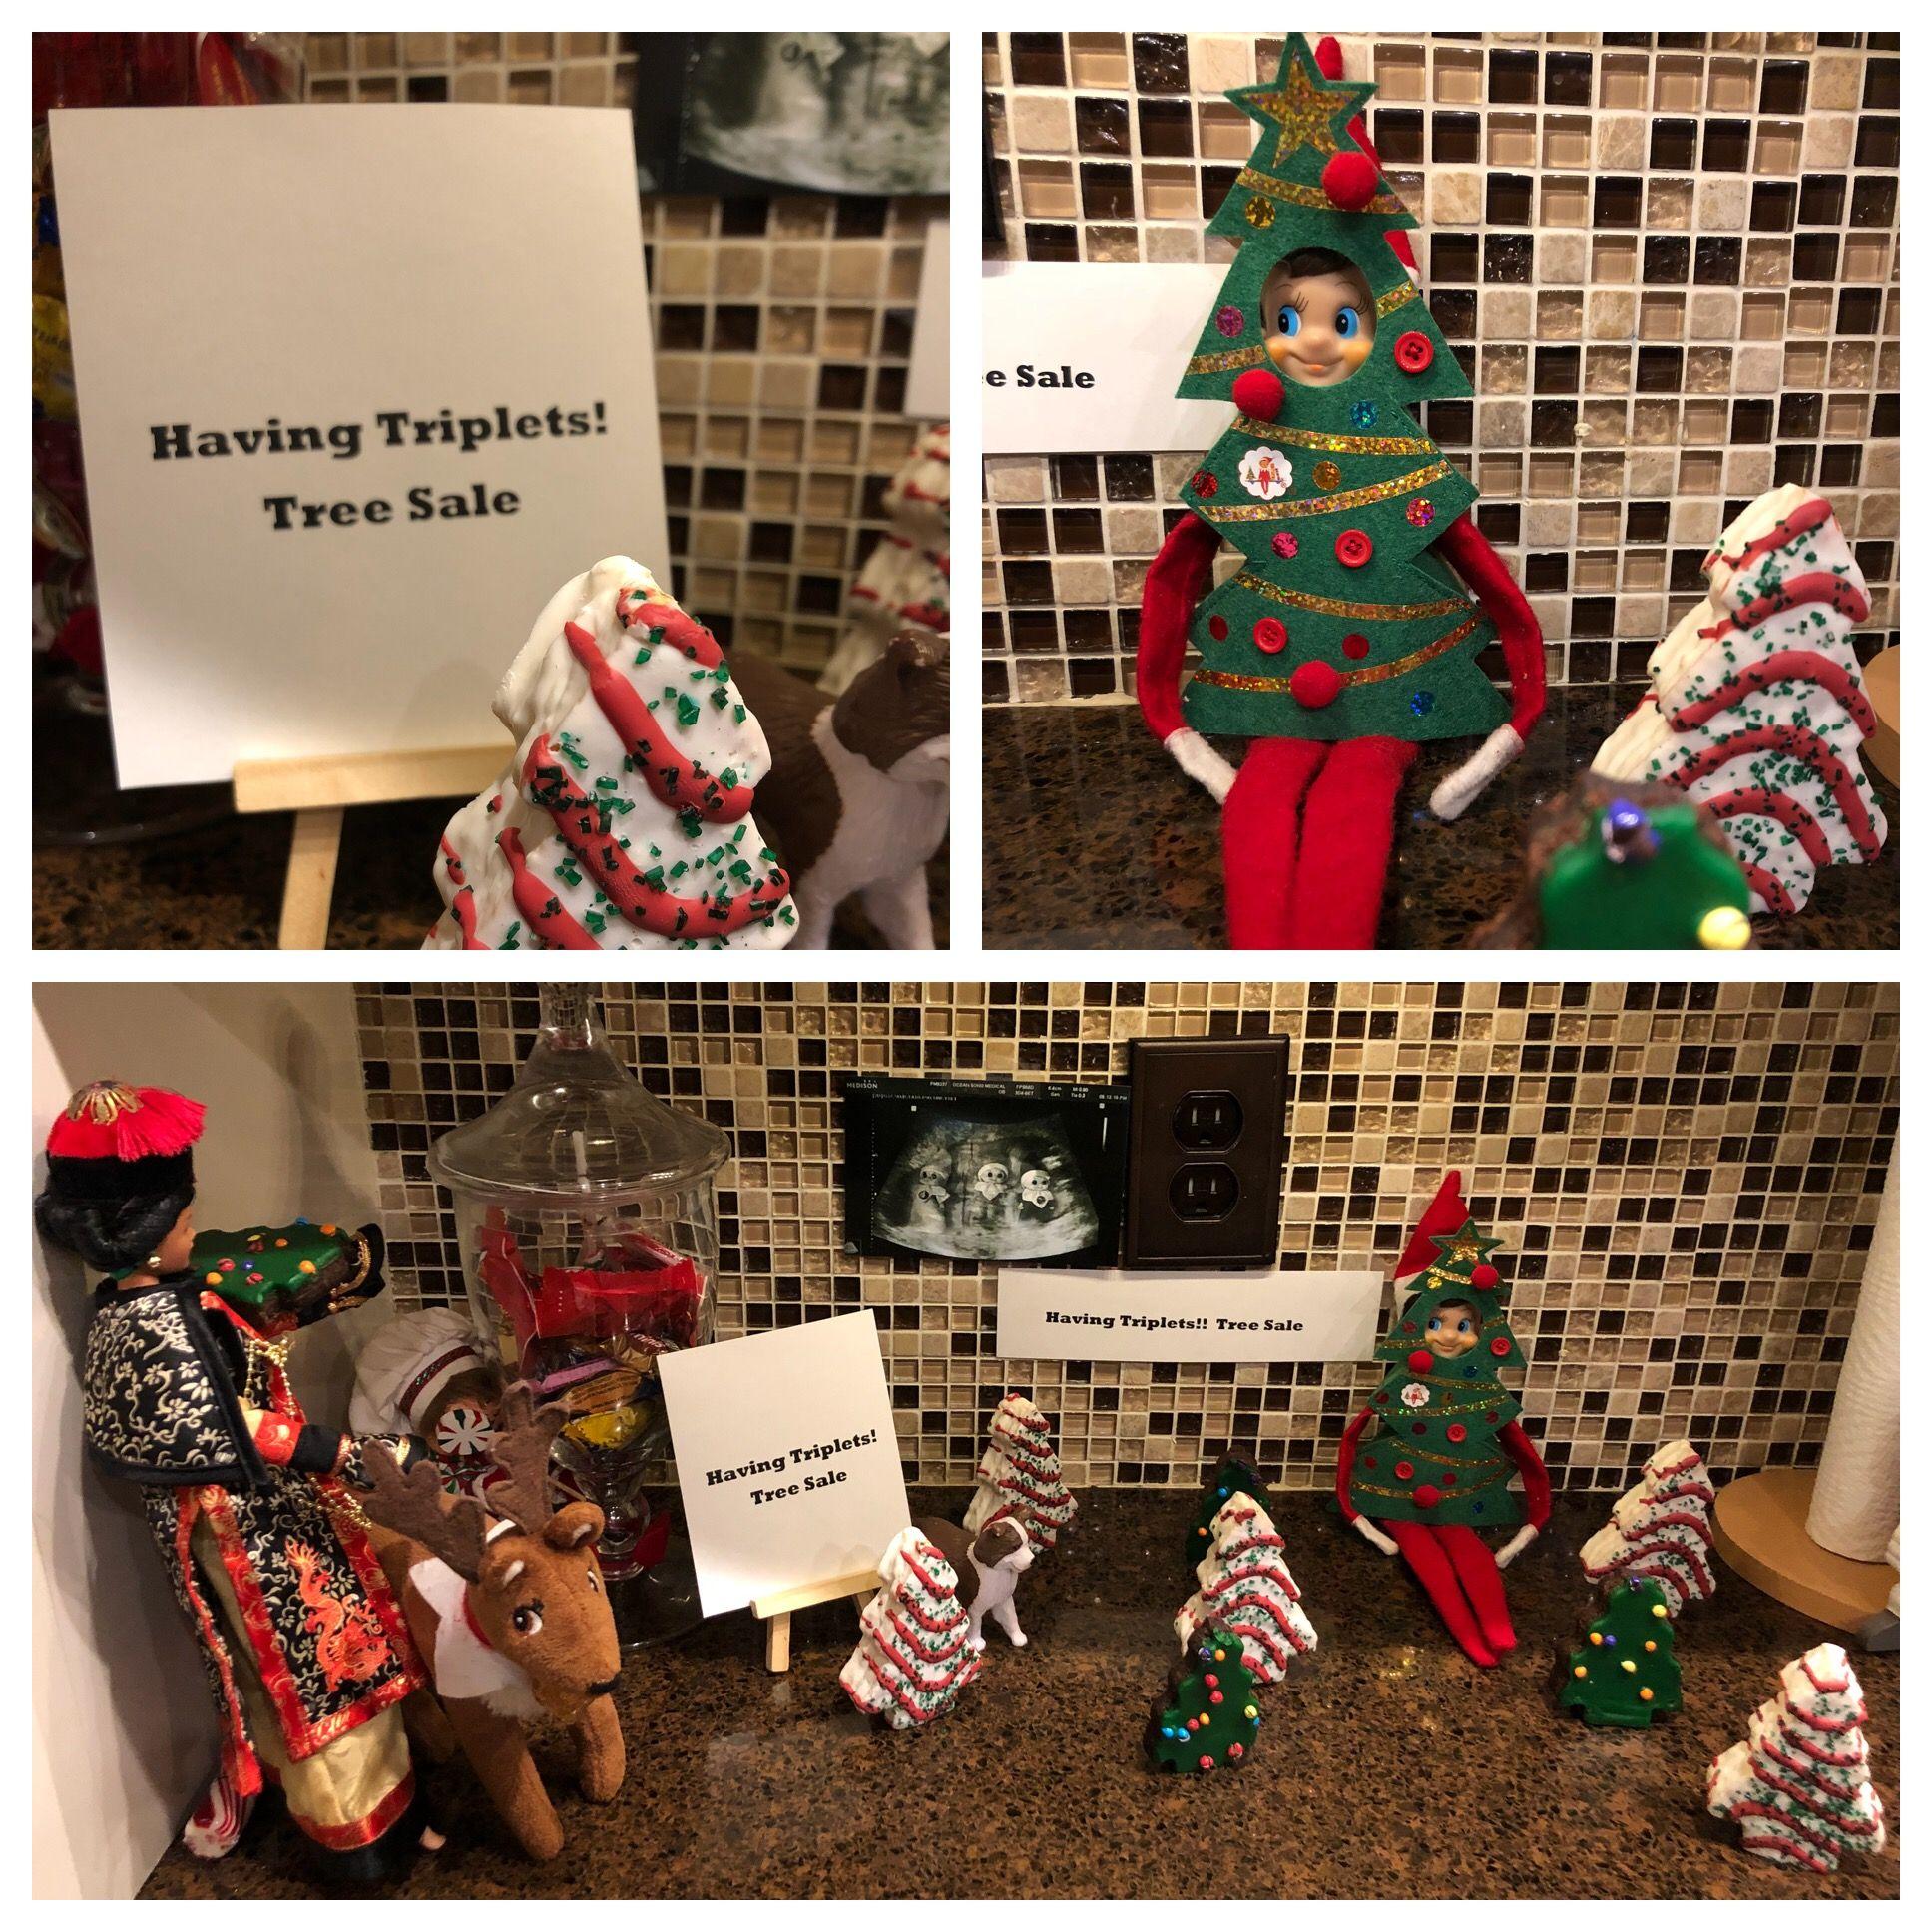 Shelf Elf Christmas Tree Sale Christmas Tree Sale Tree Sale Elf Christmas Tree